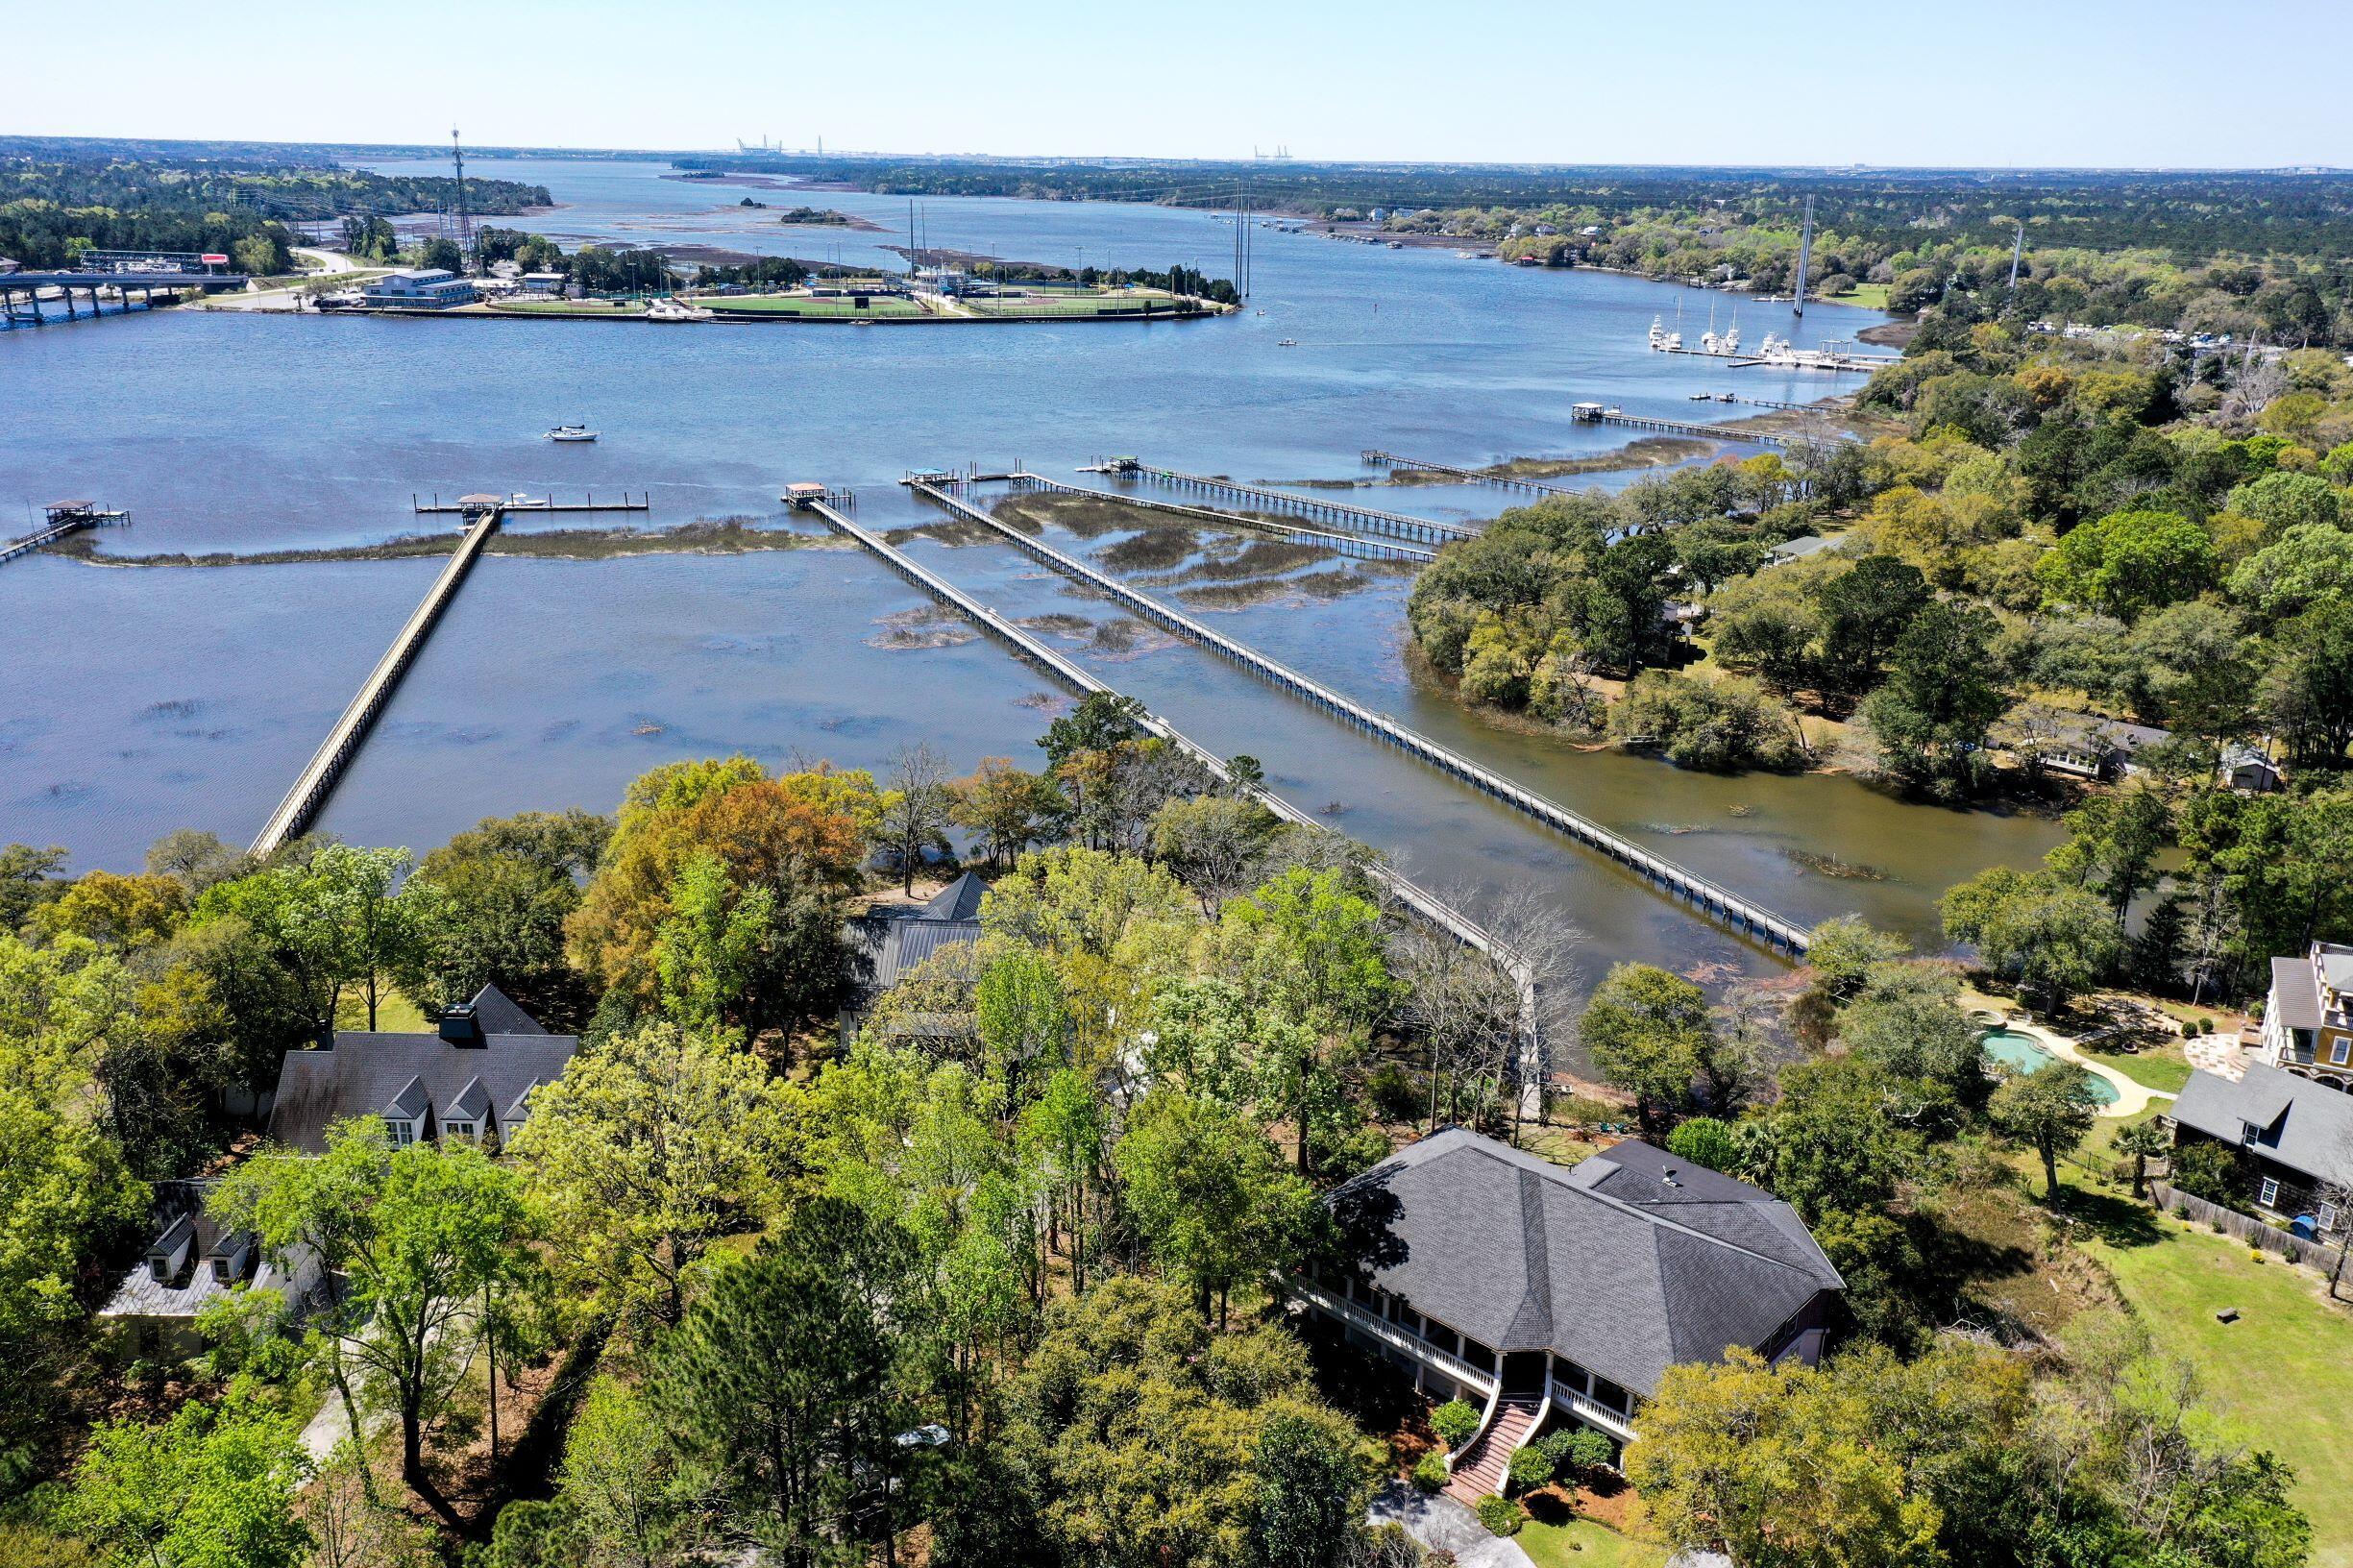 Cainhoy Landing Homes For Sale - 112 Cainhoy Landing, Charleston, SC - 80